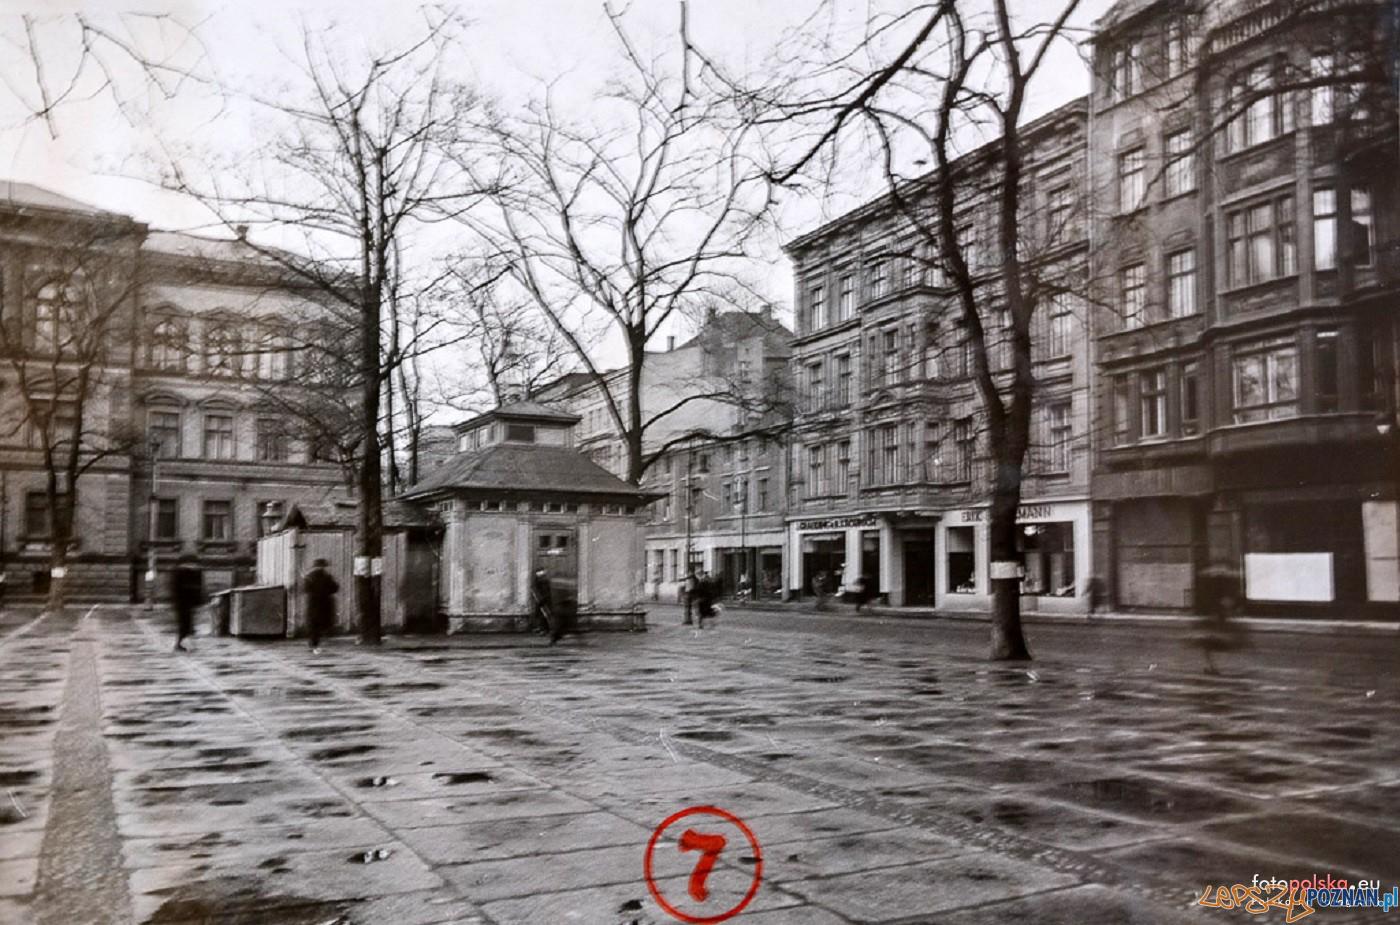 Plac Wielkopolskilata  1940-44  Foto: W. Rickweil / fotopolska.eu